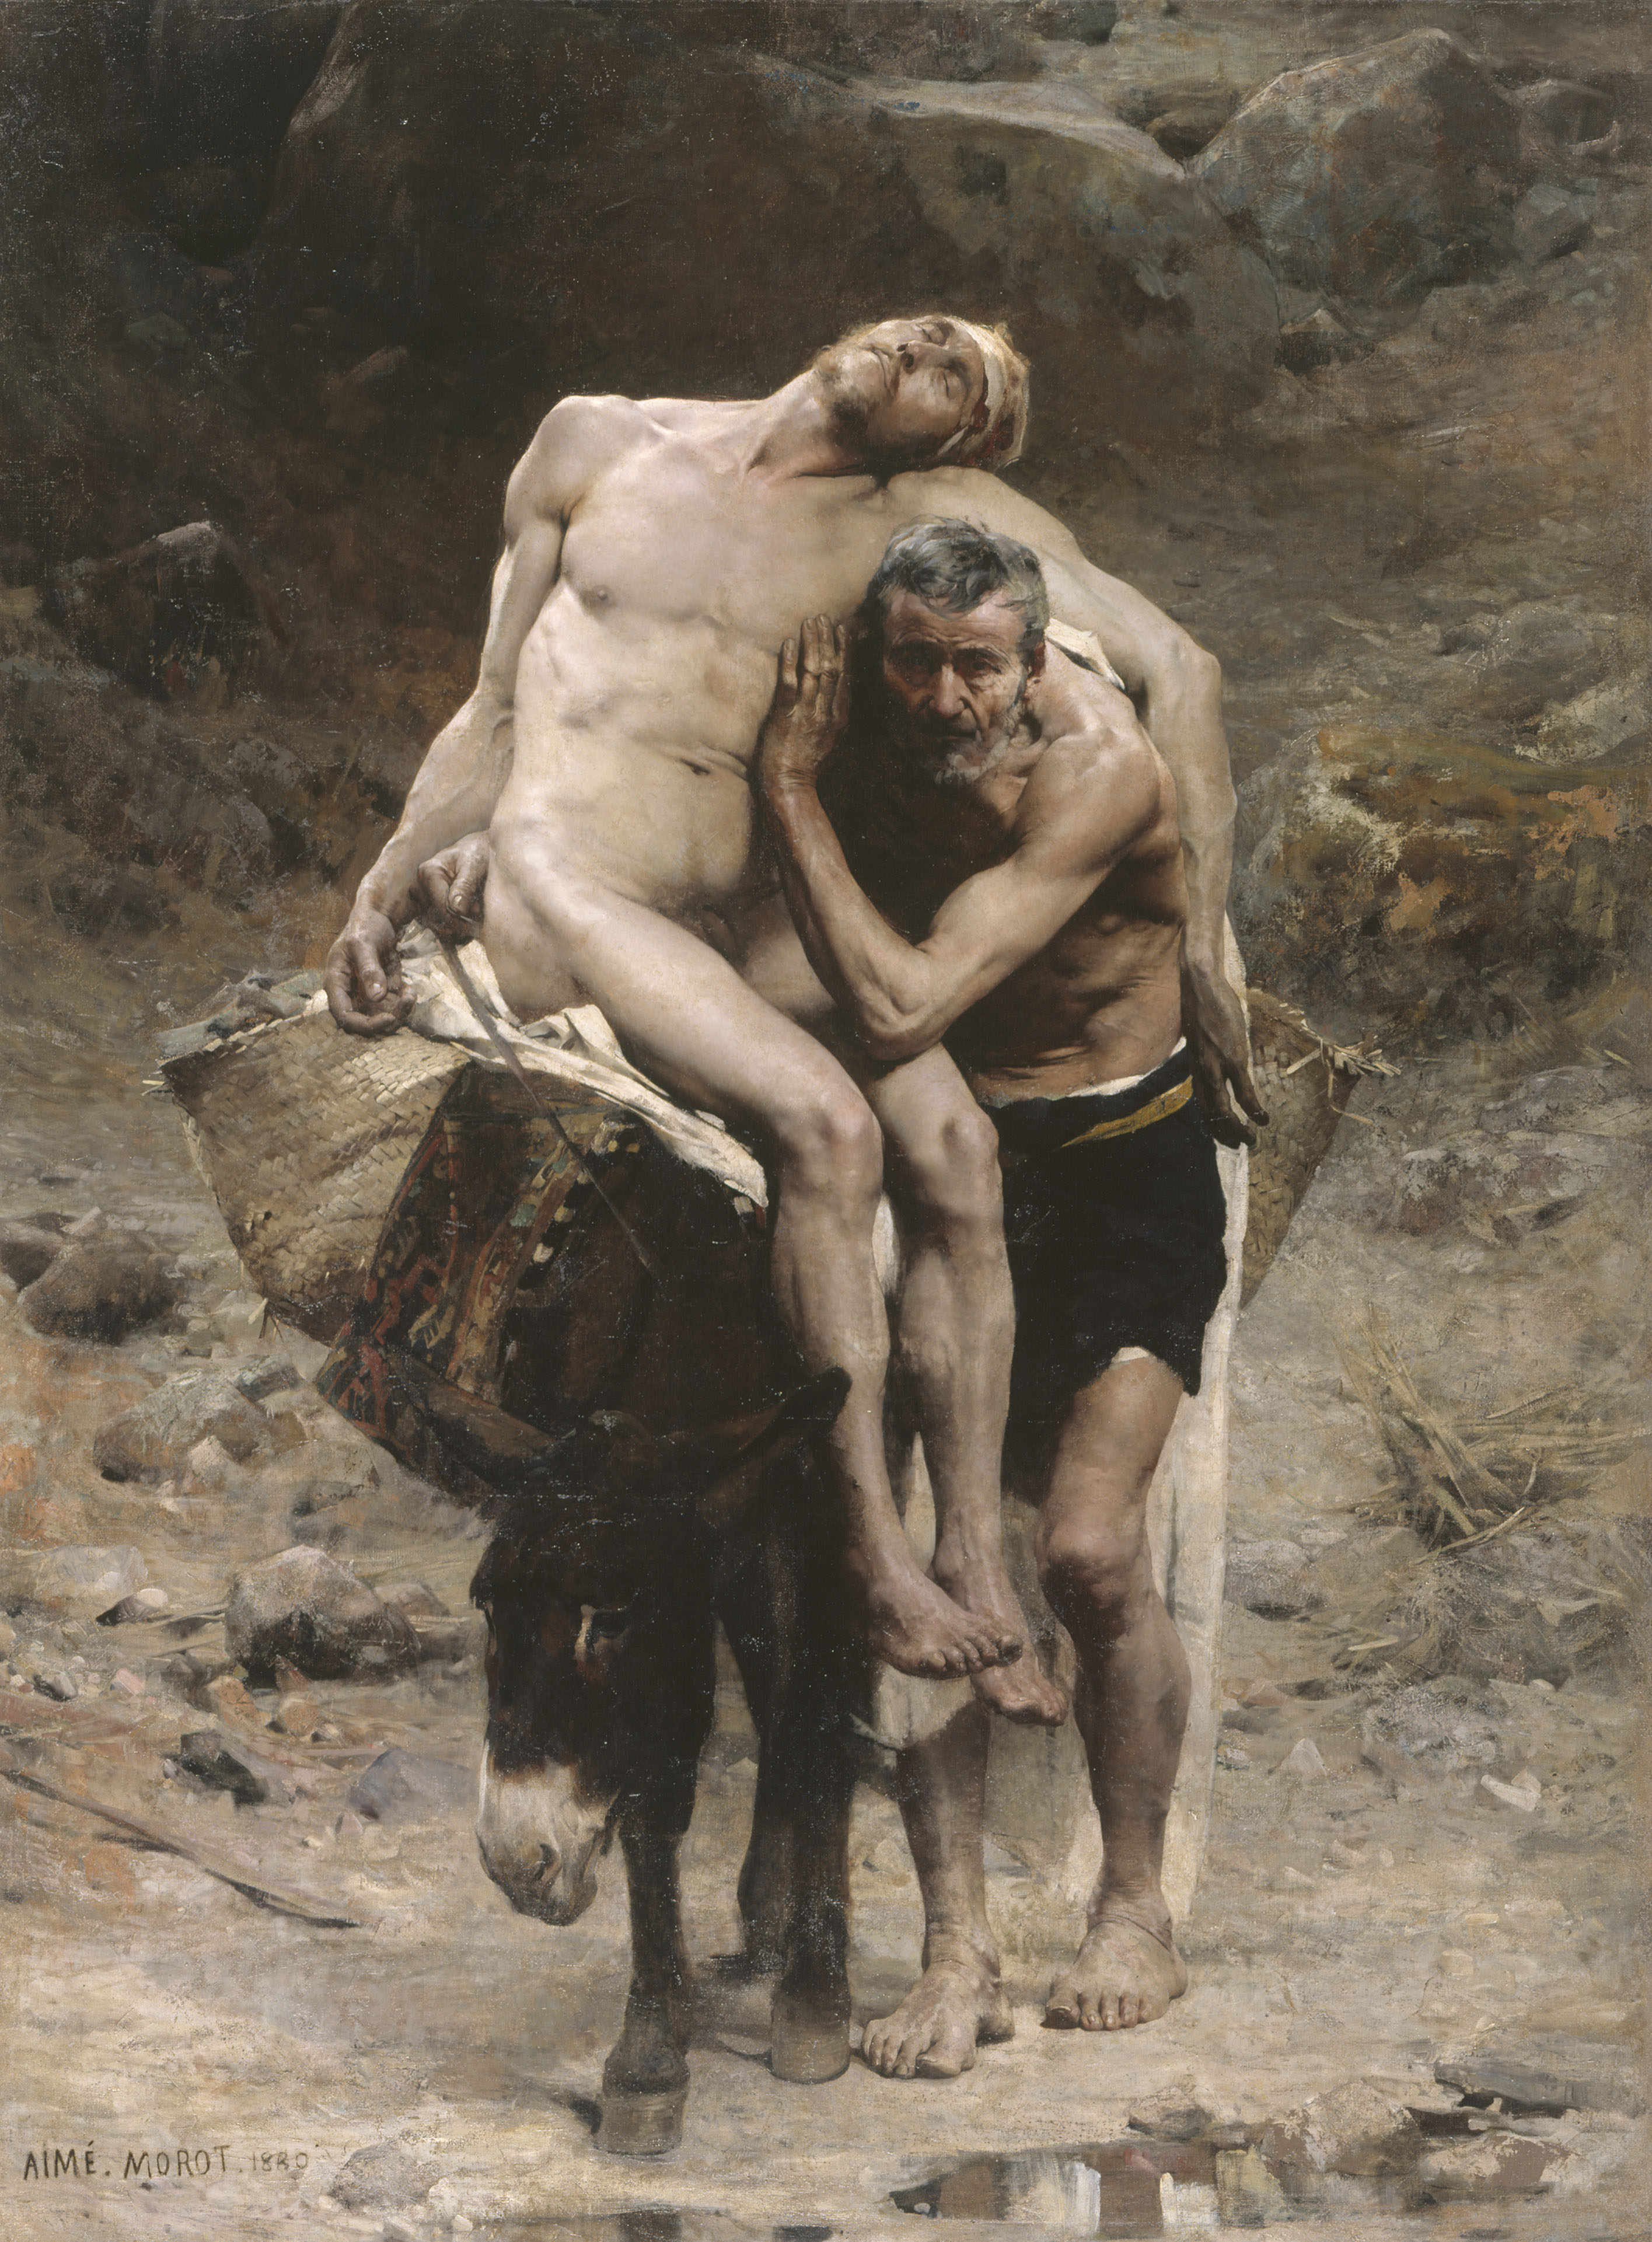 Aimé-Nicolas Morot - Le Bon Samaritain